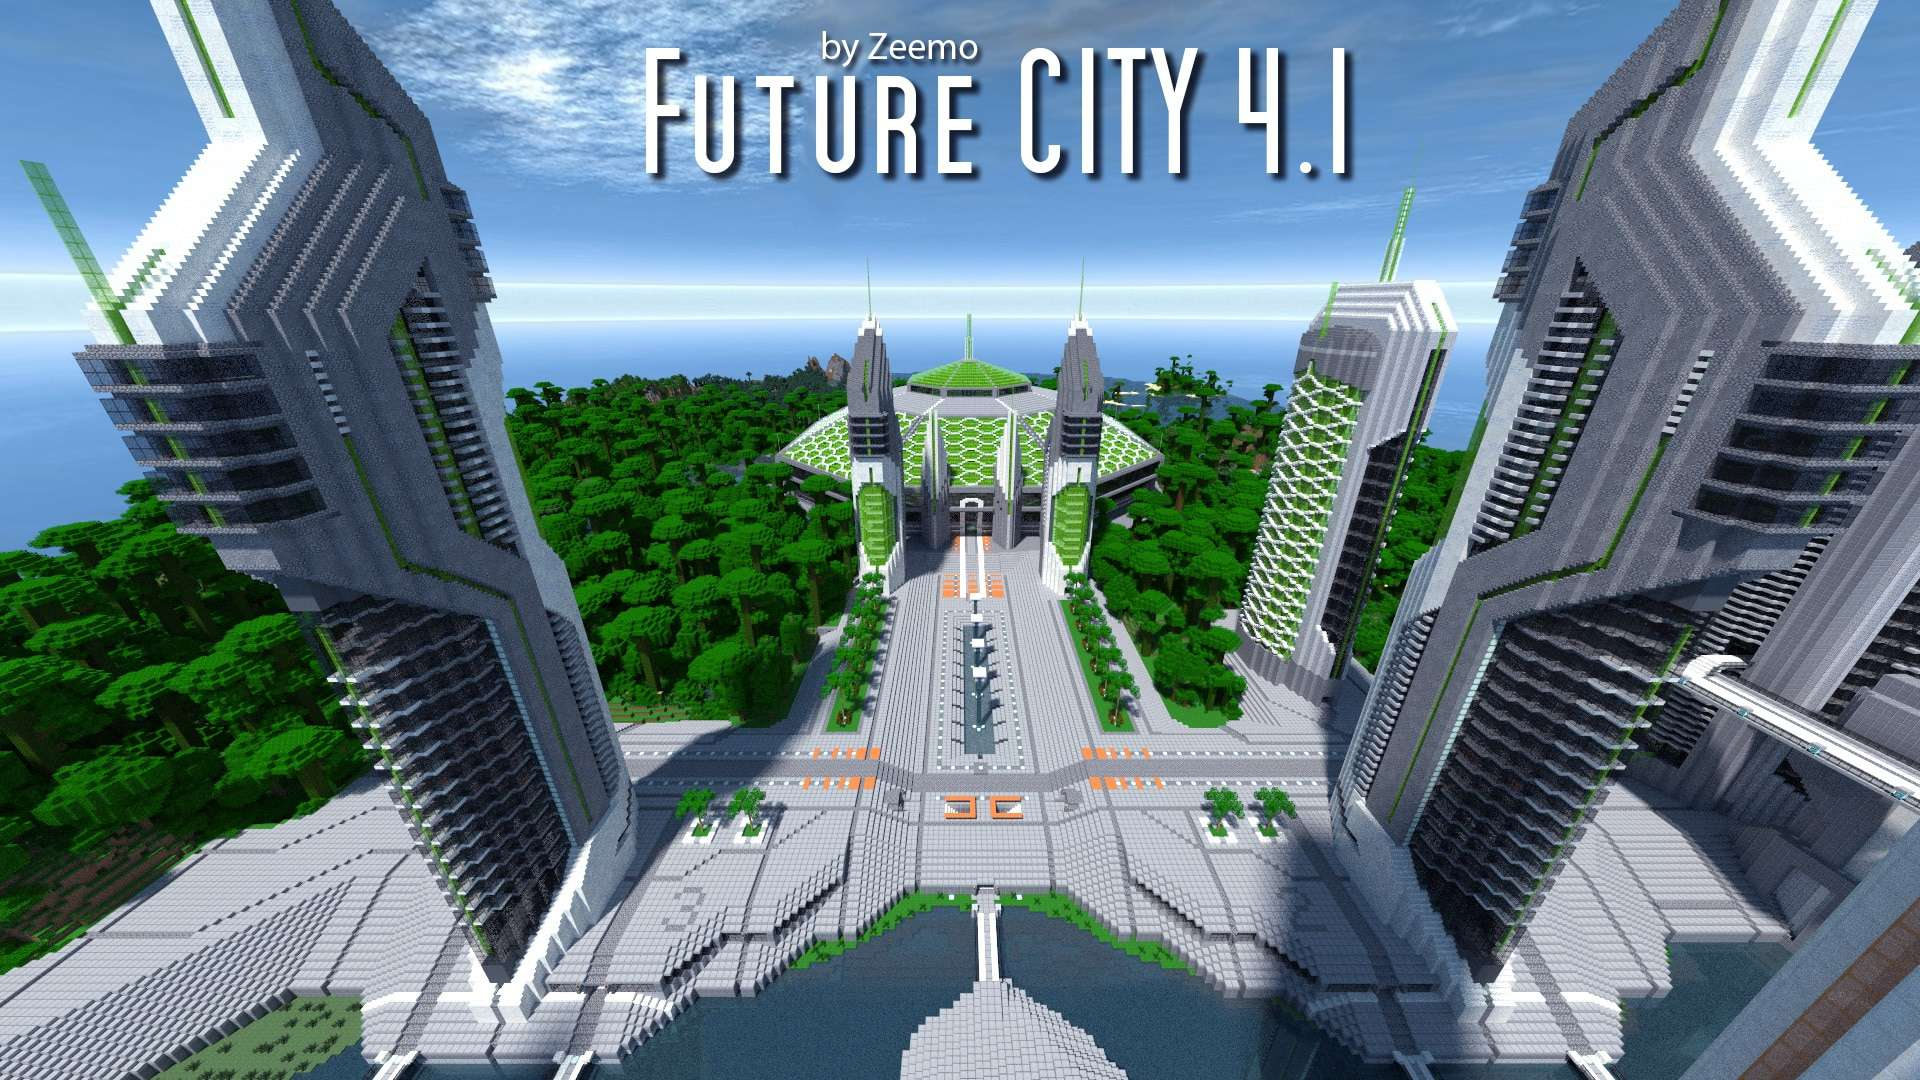 future-city_4-1_11